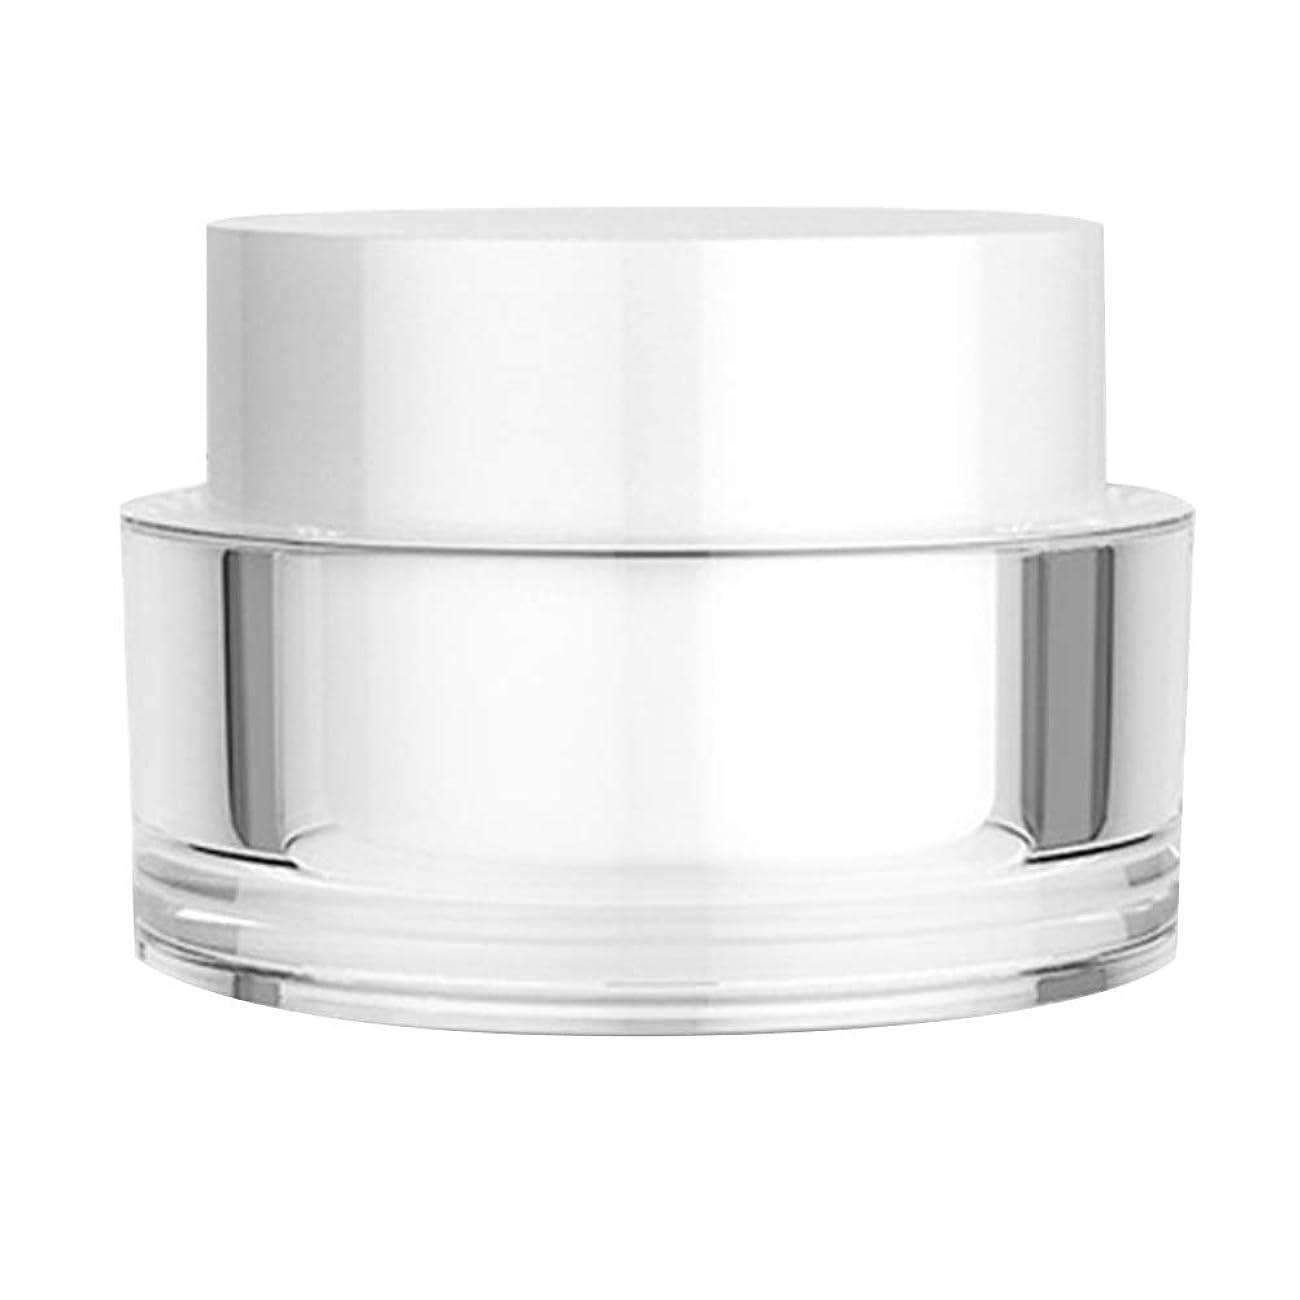 Vi.yo クリームケース 小分け容器 コスメ用詰替え容器 携帯便利 出張 旅行用品 50g